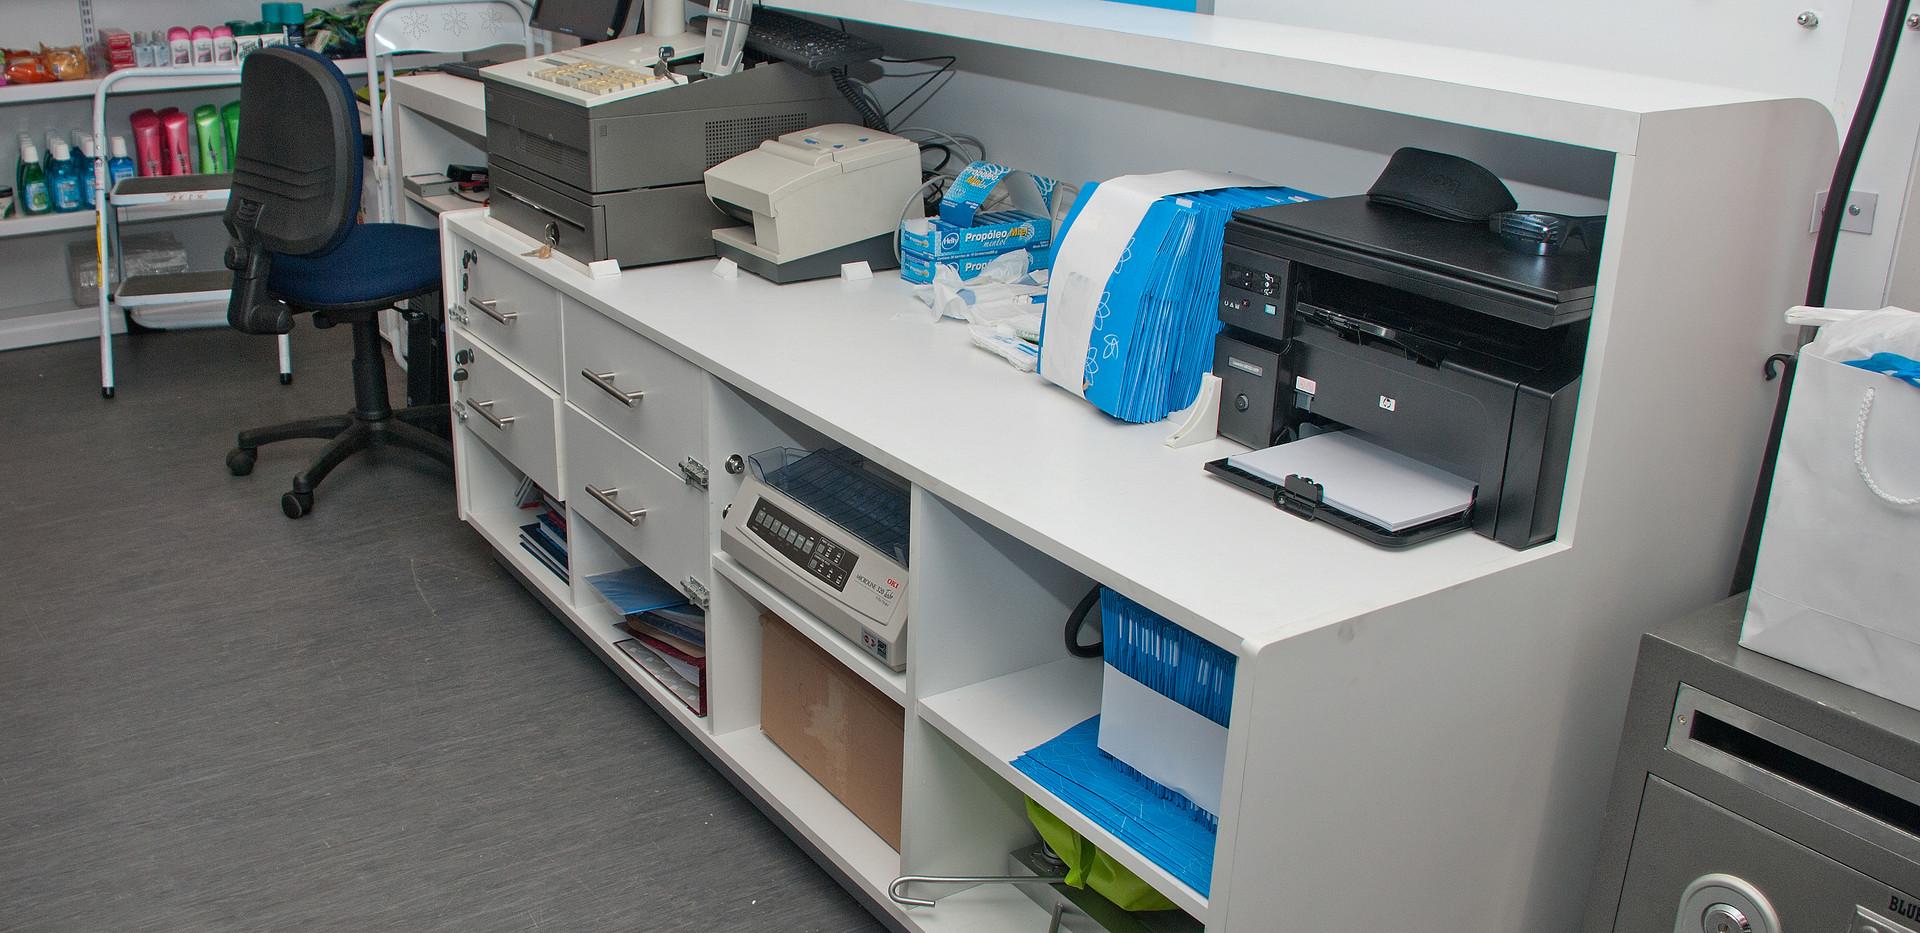 moviliario farmacia movil salcobrand.jpg